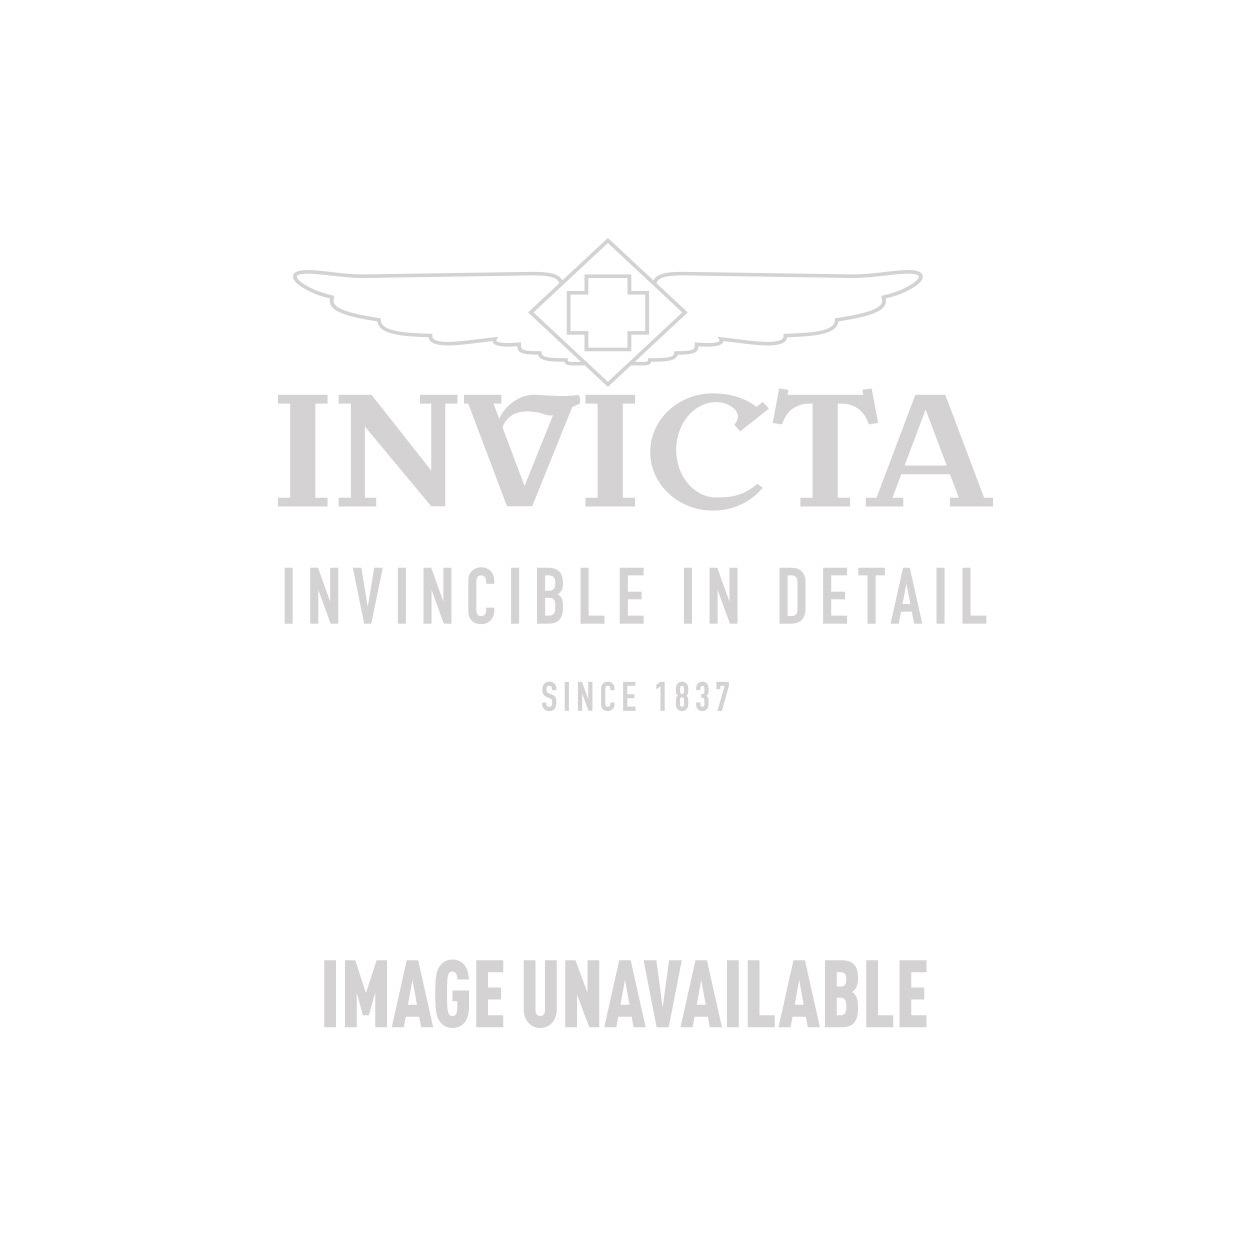 Invicta S1 Rally Quartz Watch - Black case with Black, Orange tone Leather band - Model 19288